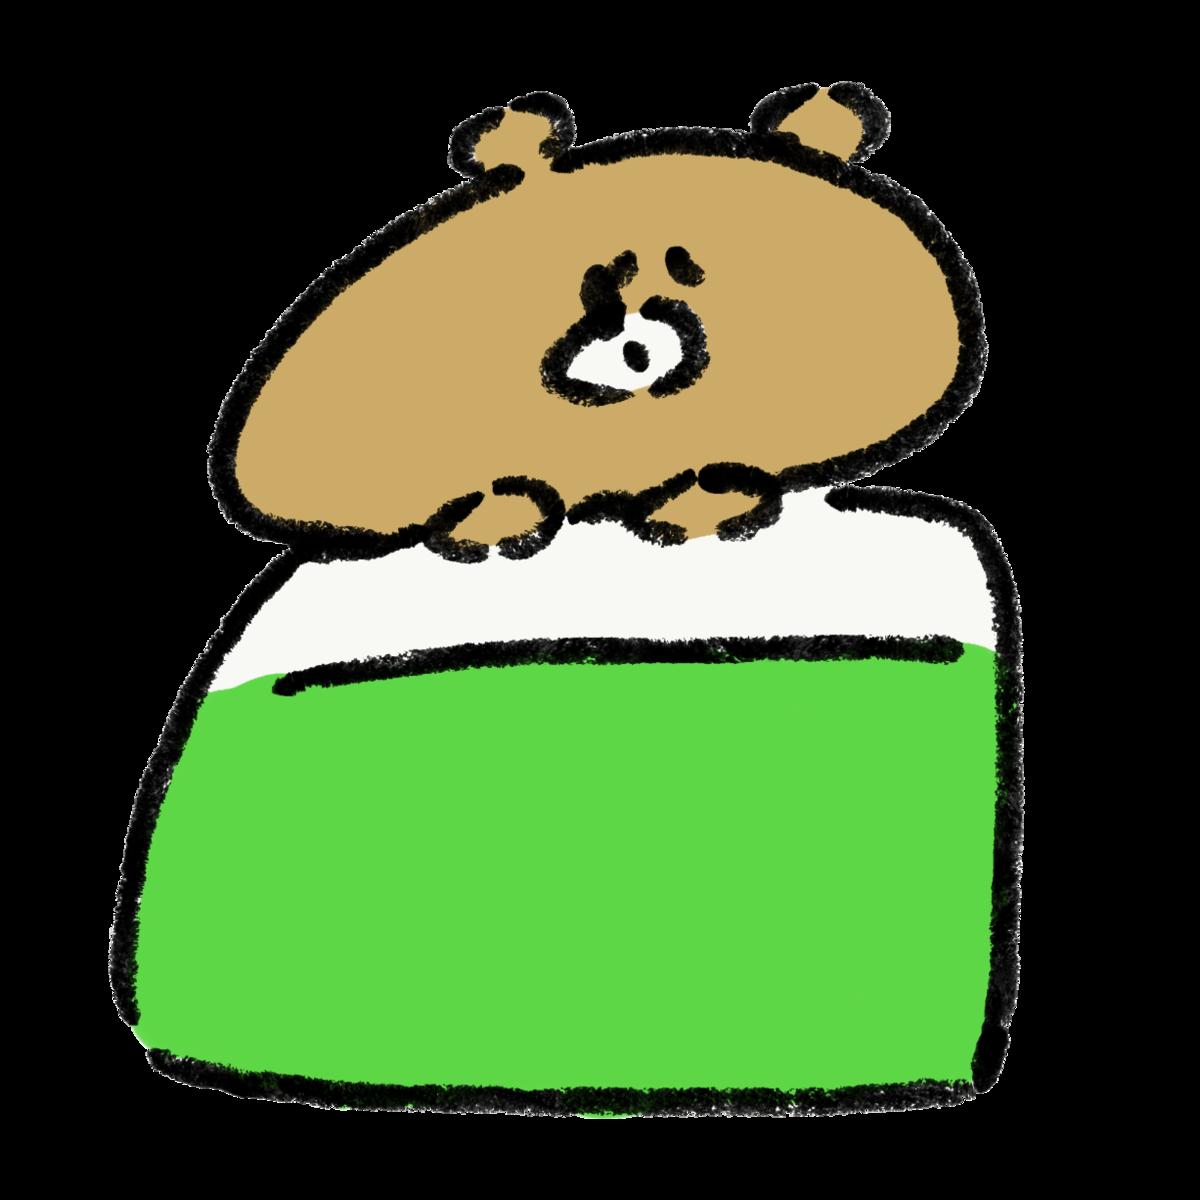 f:id:grigra-mom:20210417184851p:plain